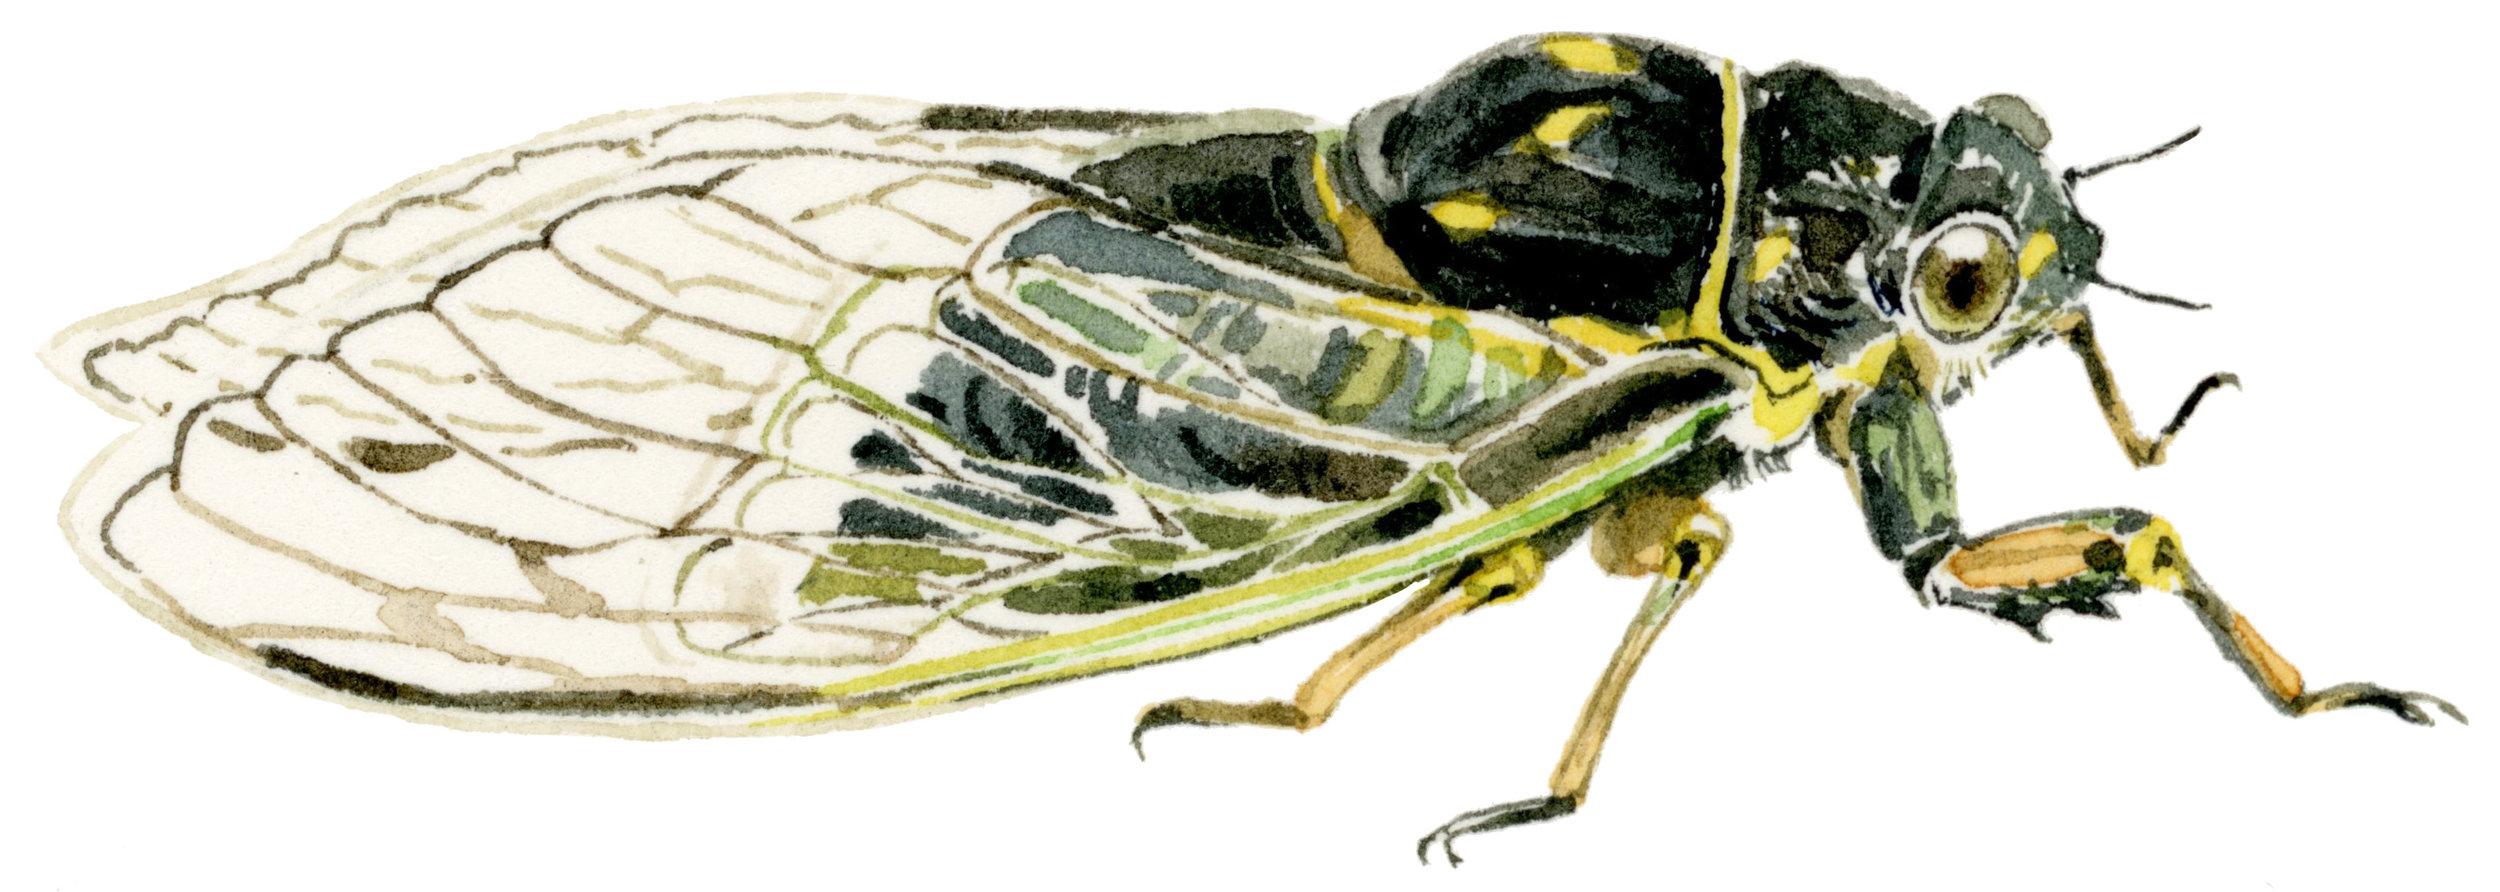 cicada-lrg.jpg